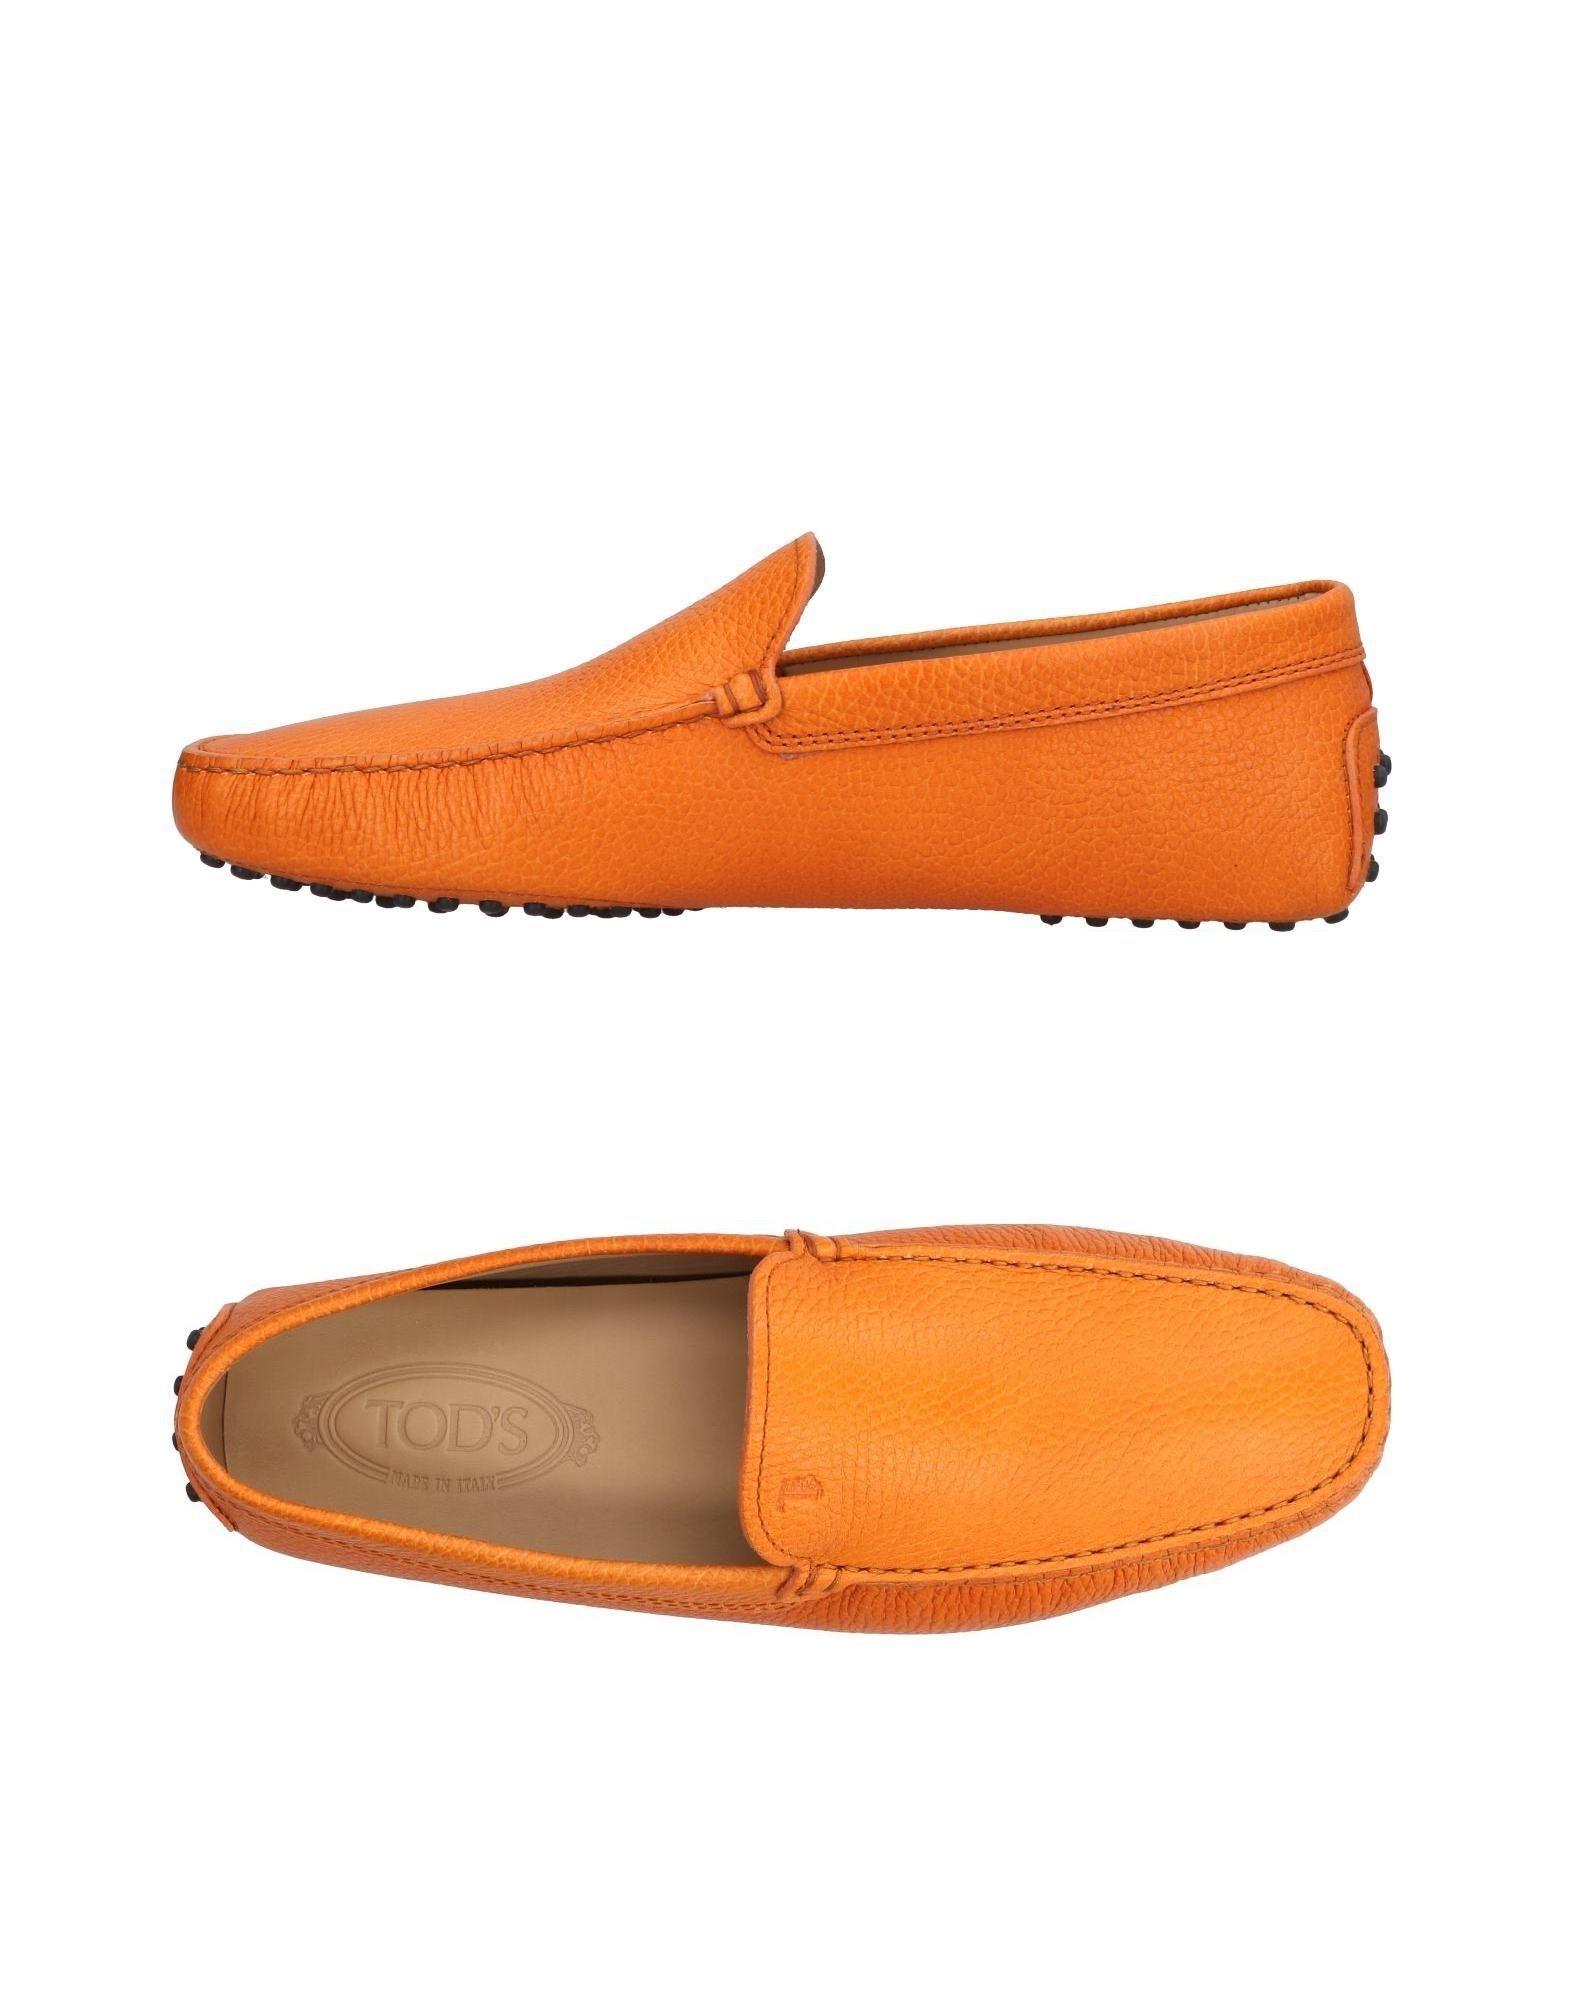 Tod's Mokassins Herren  11396368RF Gute Qualität beliebte Schuhe